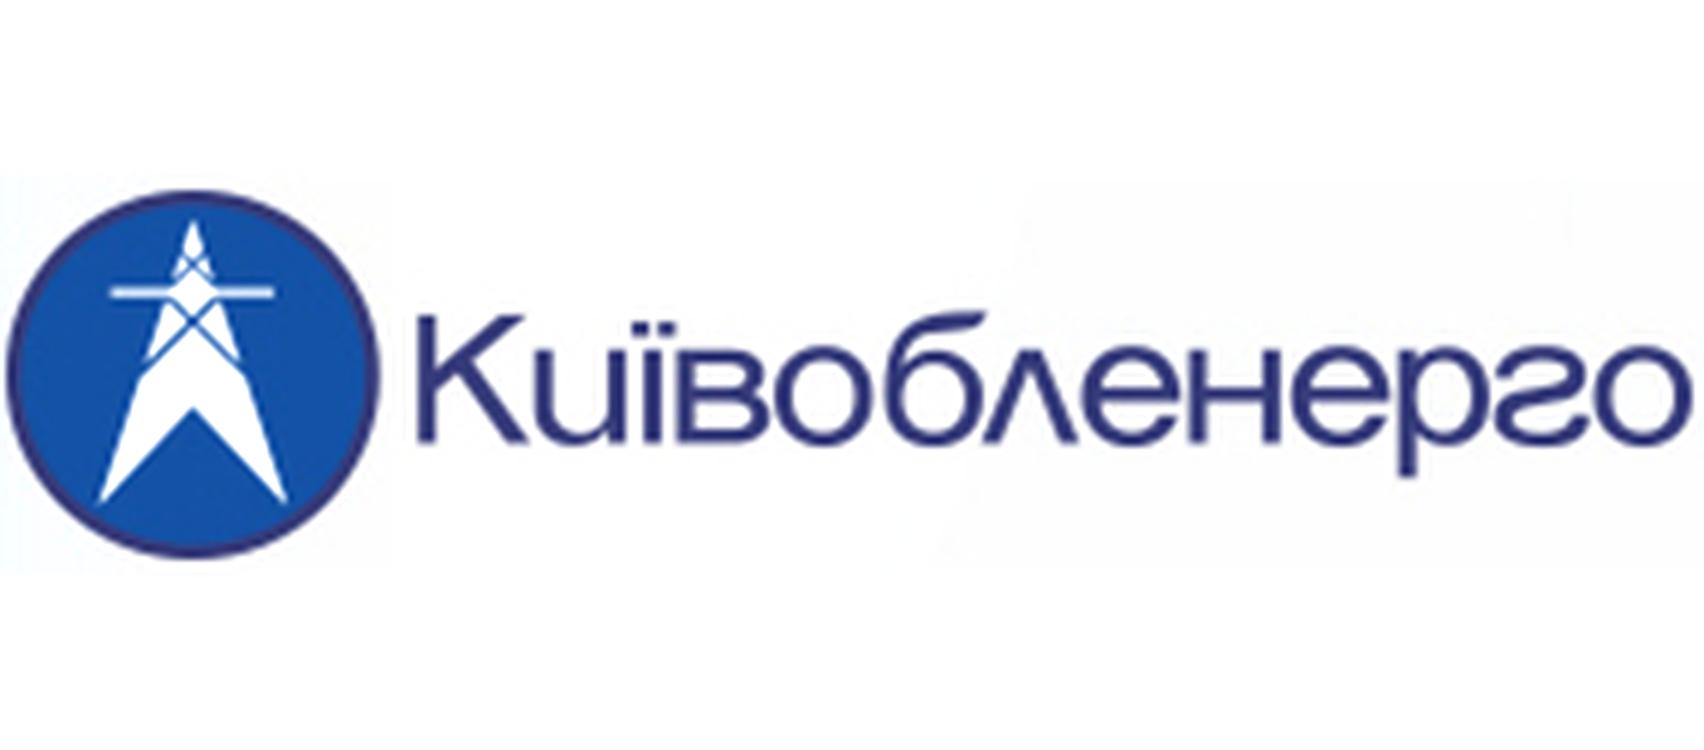 "ПАТ ""Київобленерго"" Васильківський РЕМ  (p) (за послуги до 31.12.2018)"